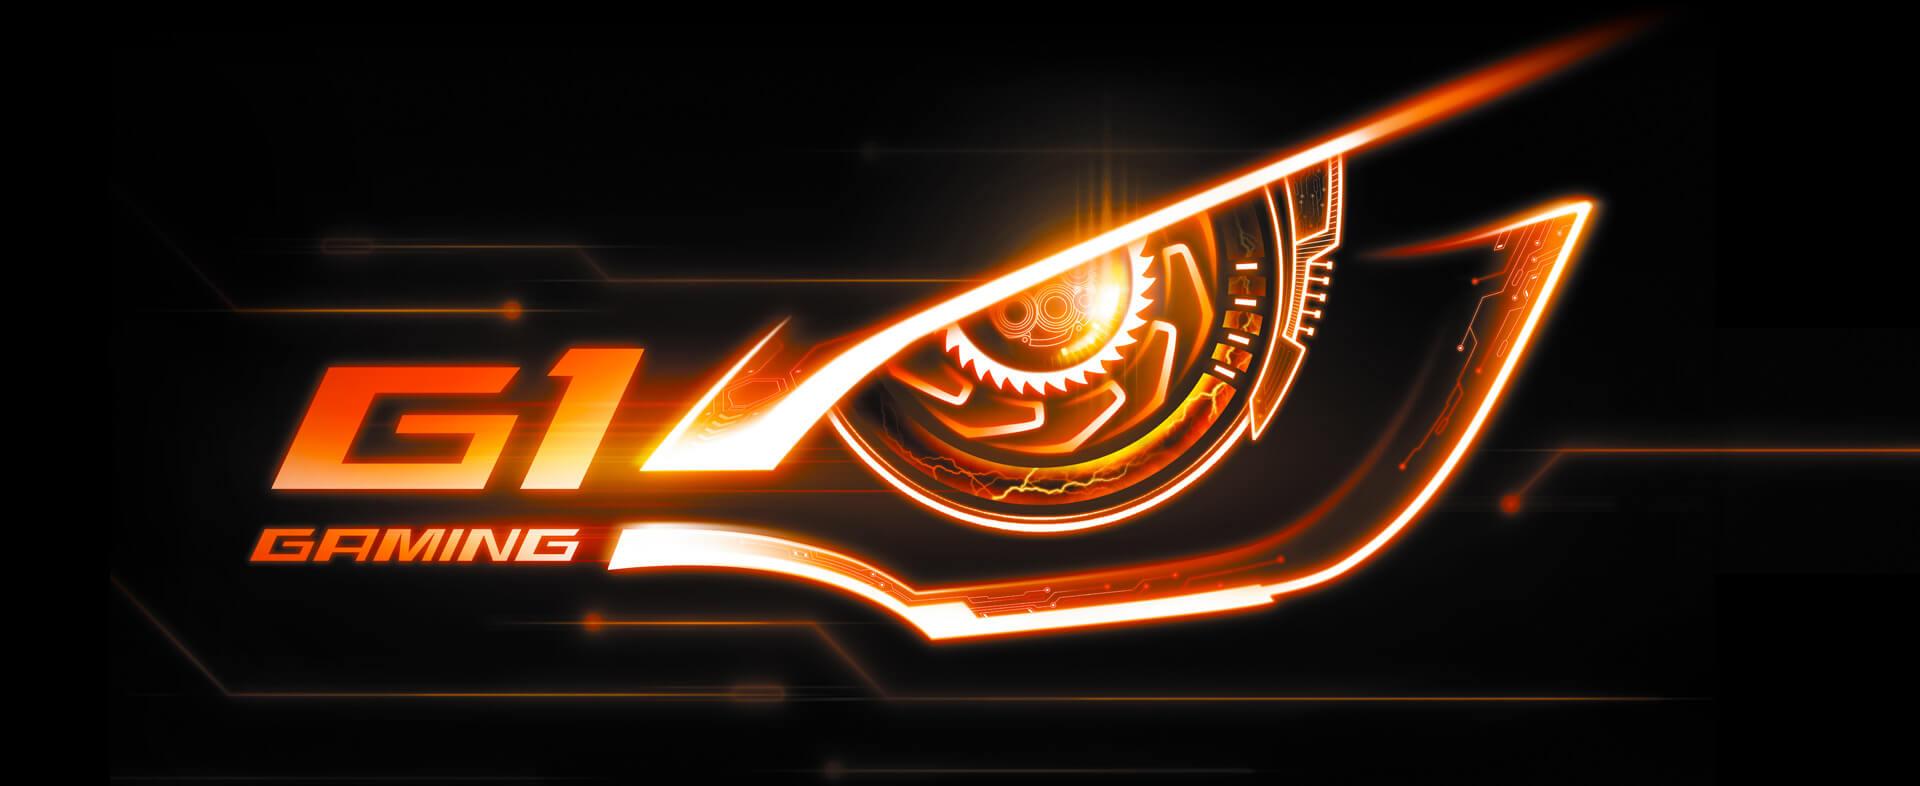 GeForce® GTX 1050 Ti G1 Gaming 4G | Graphics Card - GIGABYTE Global